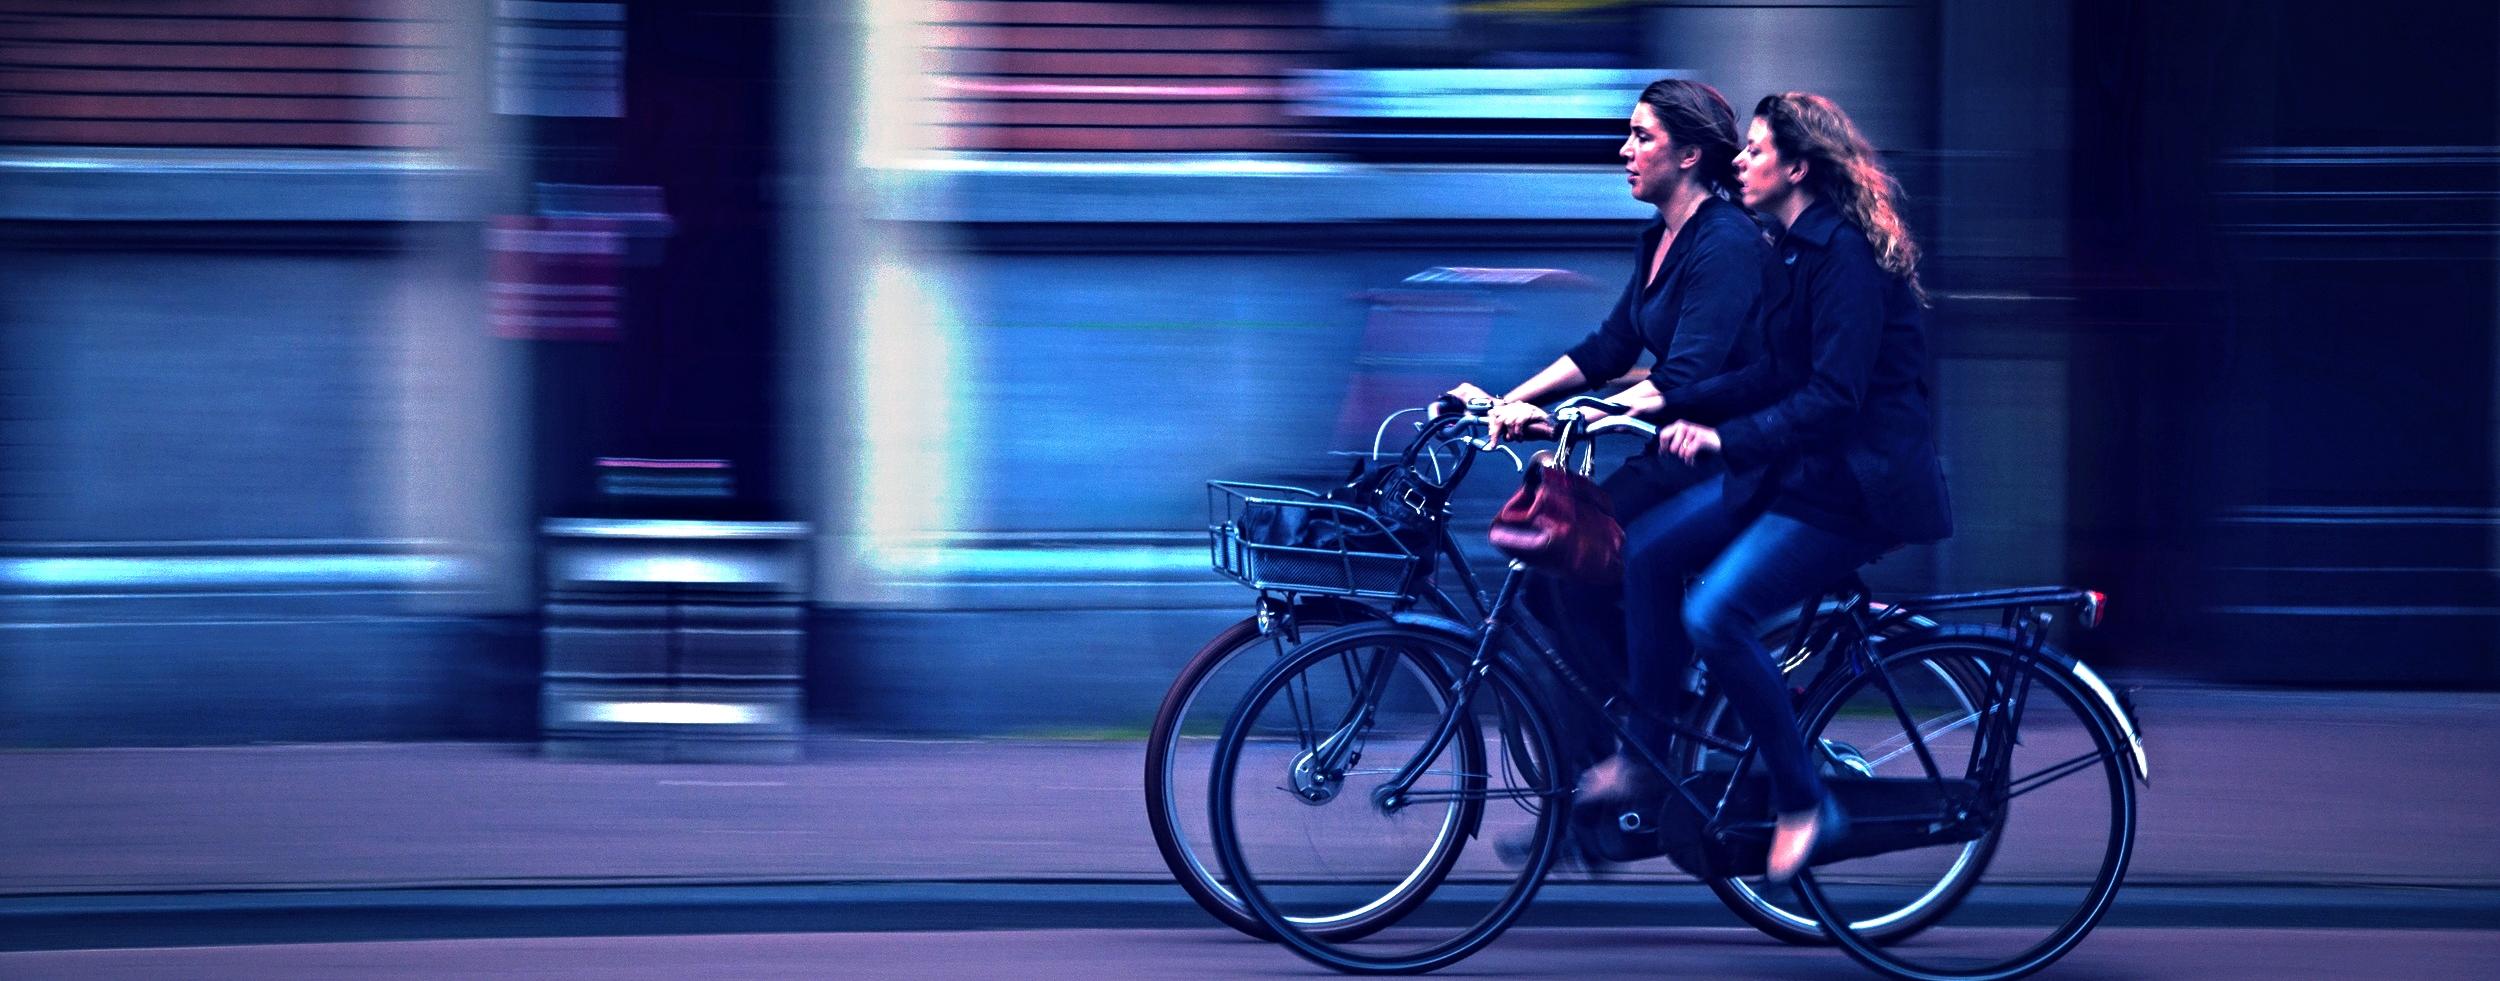 bike accident lawyer